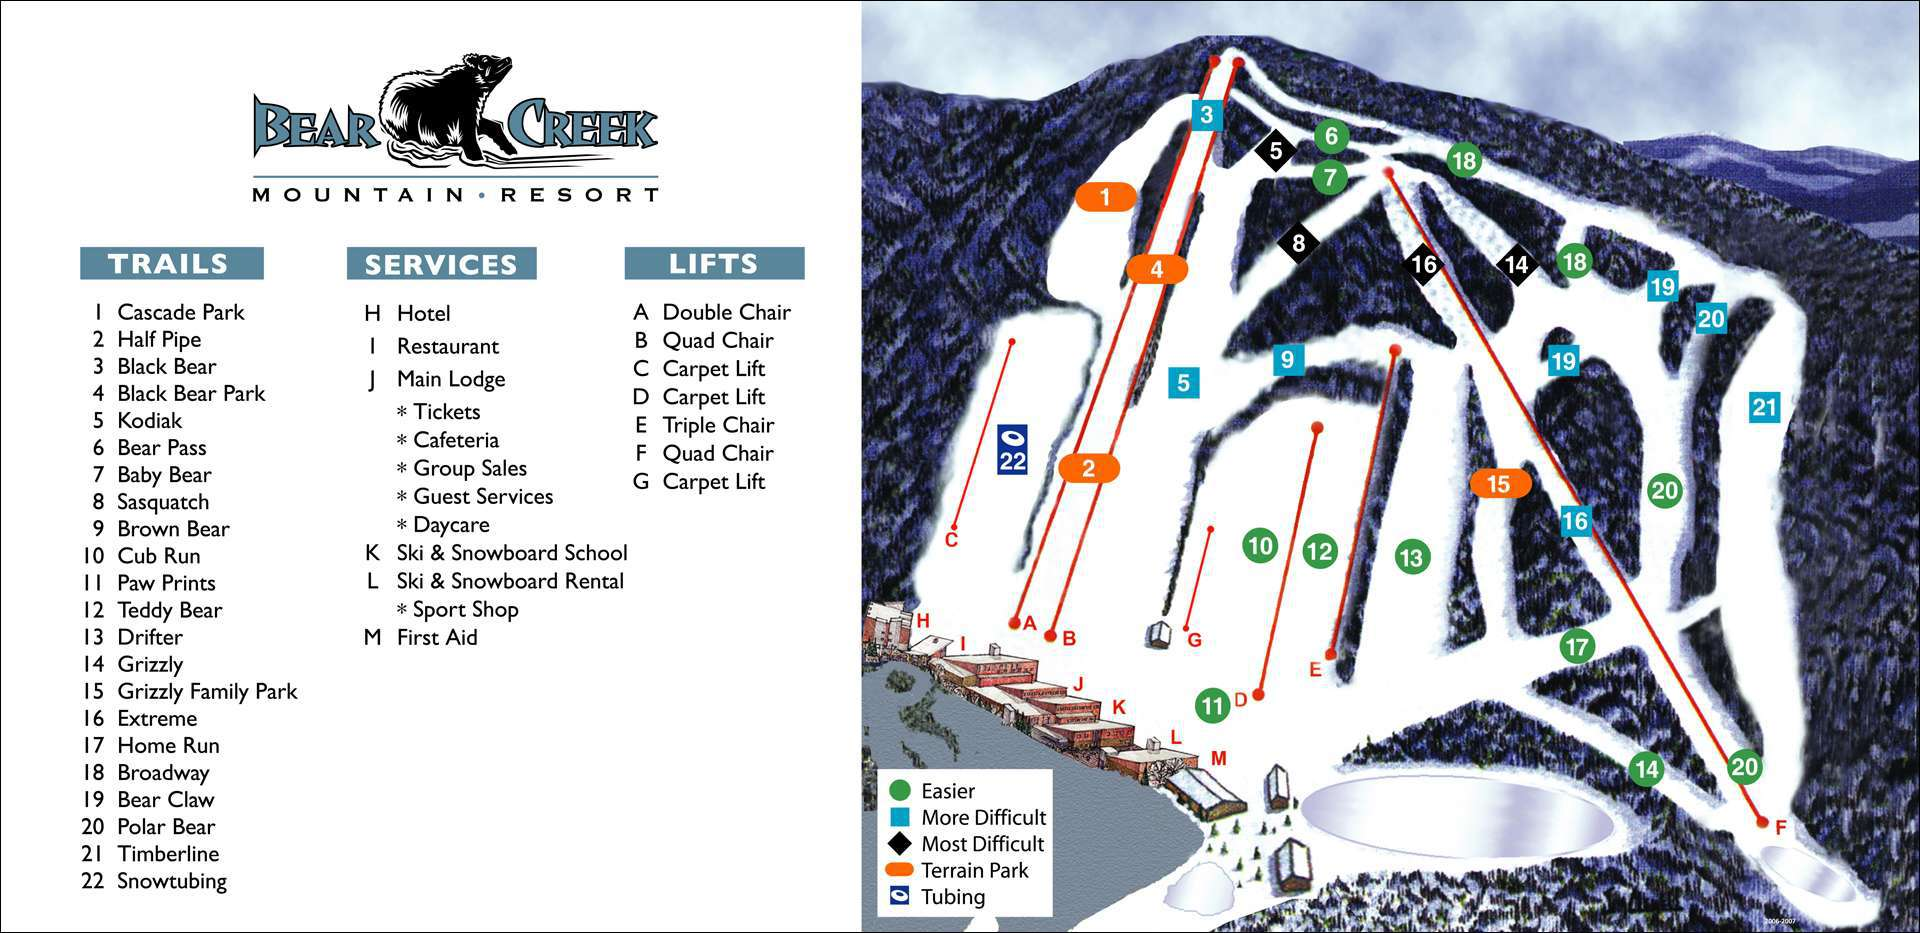 bear creek mountain resort trail map | onthesnow